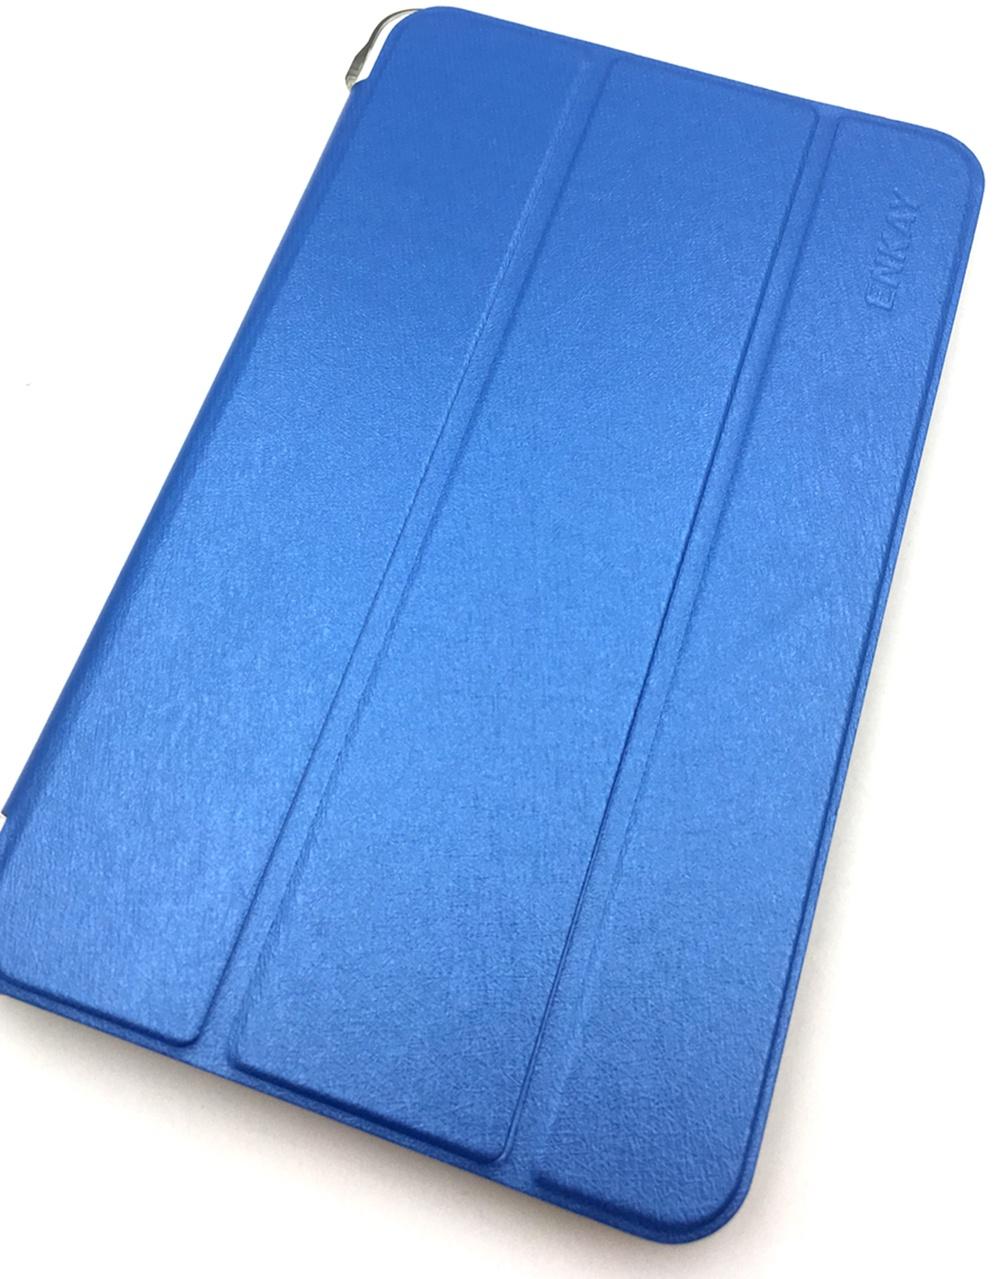 Чехол для планшета Мобильная мода Samsung Tab E 8.0 T375/T377 Чехол-книжка Enkay, Leather Case, 5370, голубой